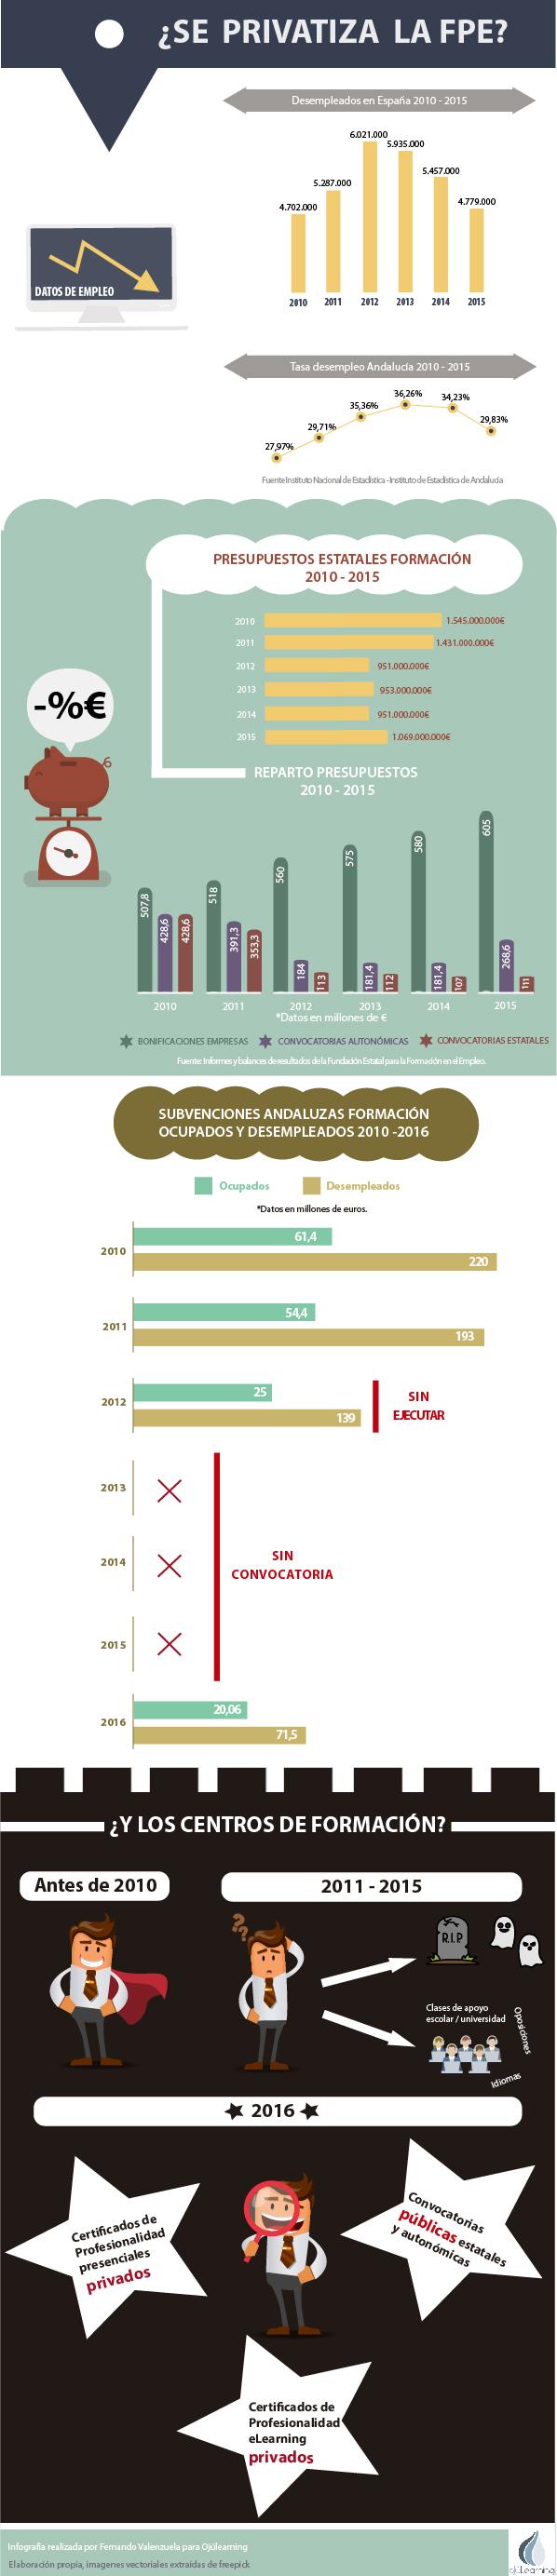 infografia-privatizacion-fpe